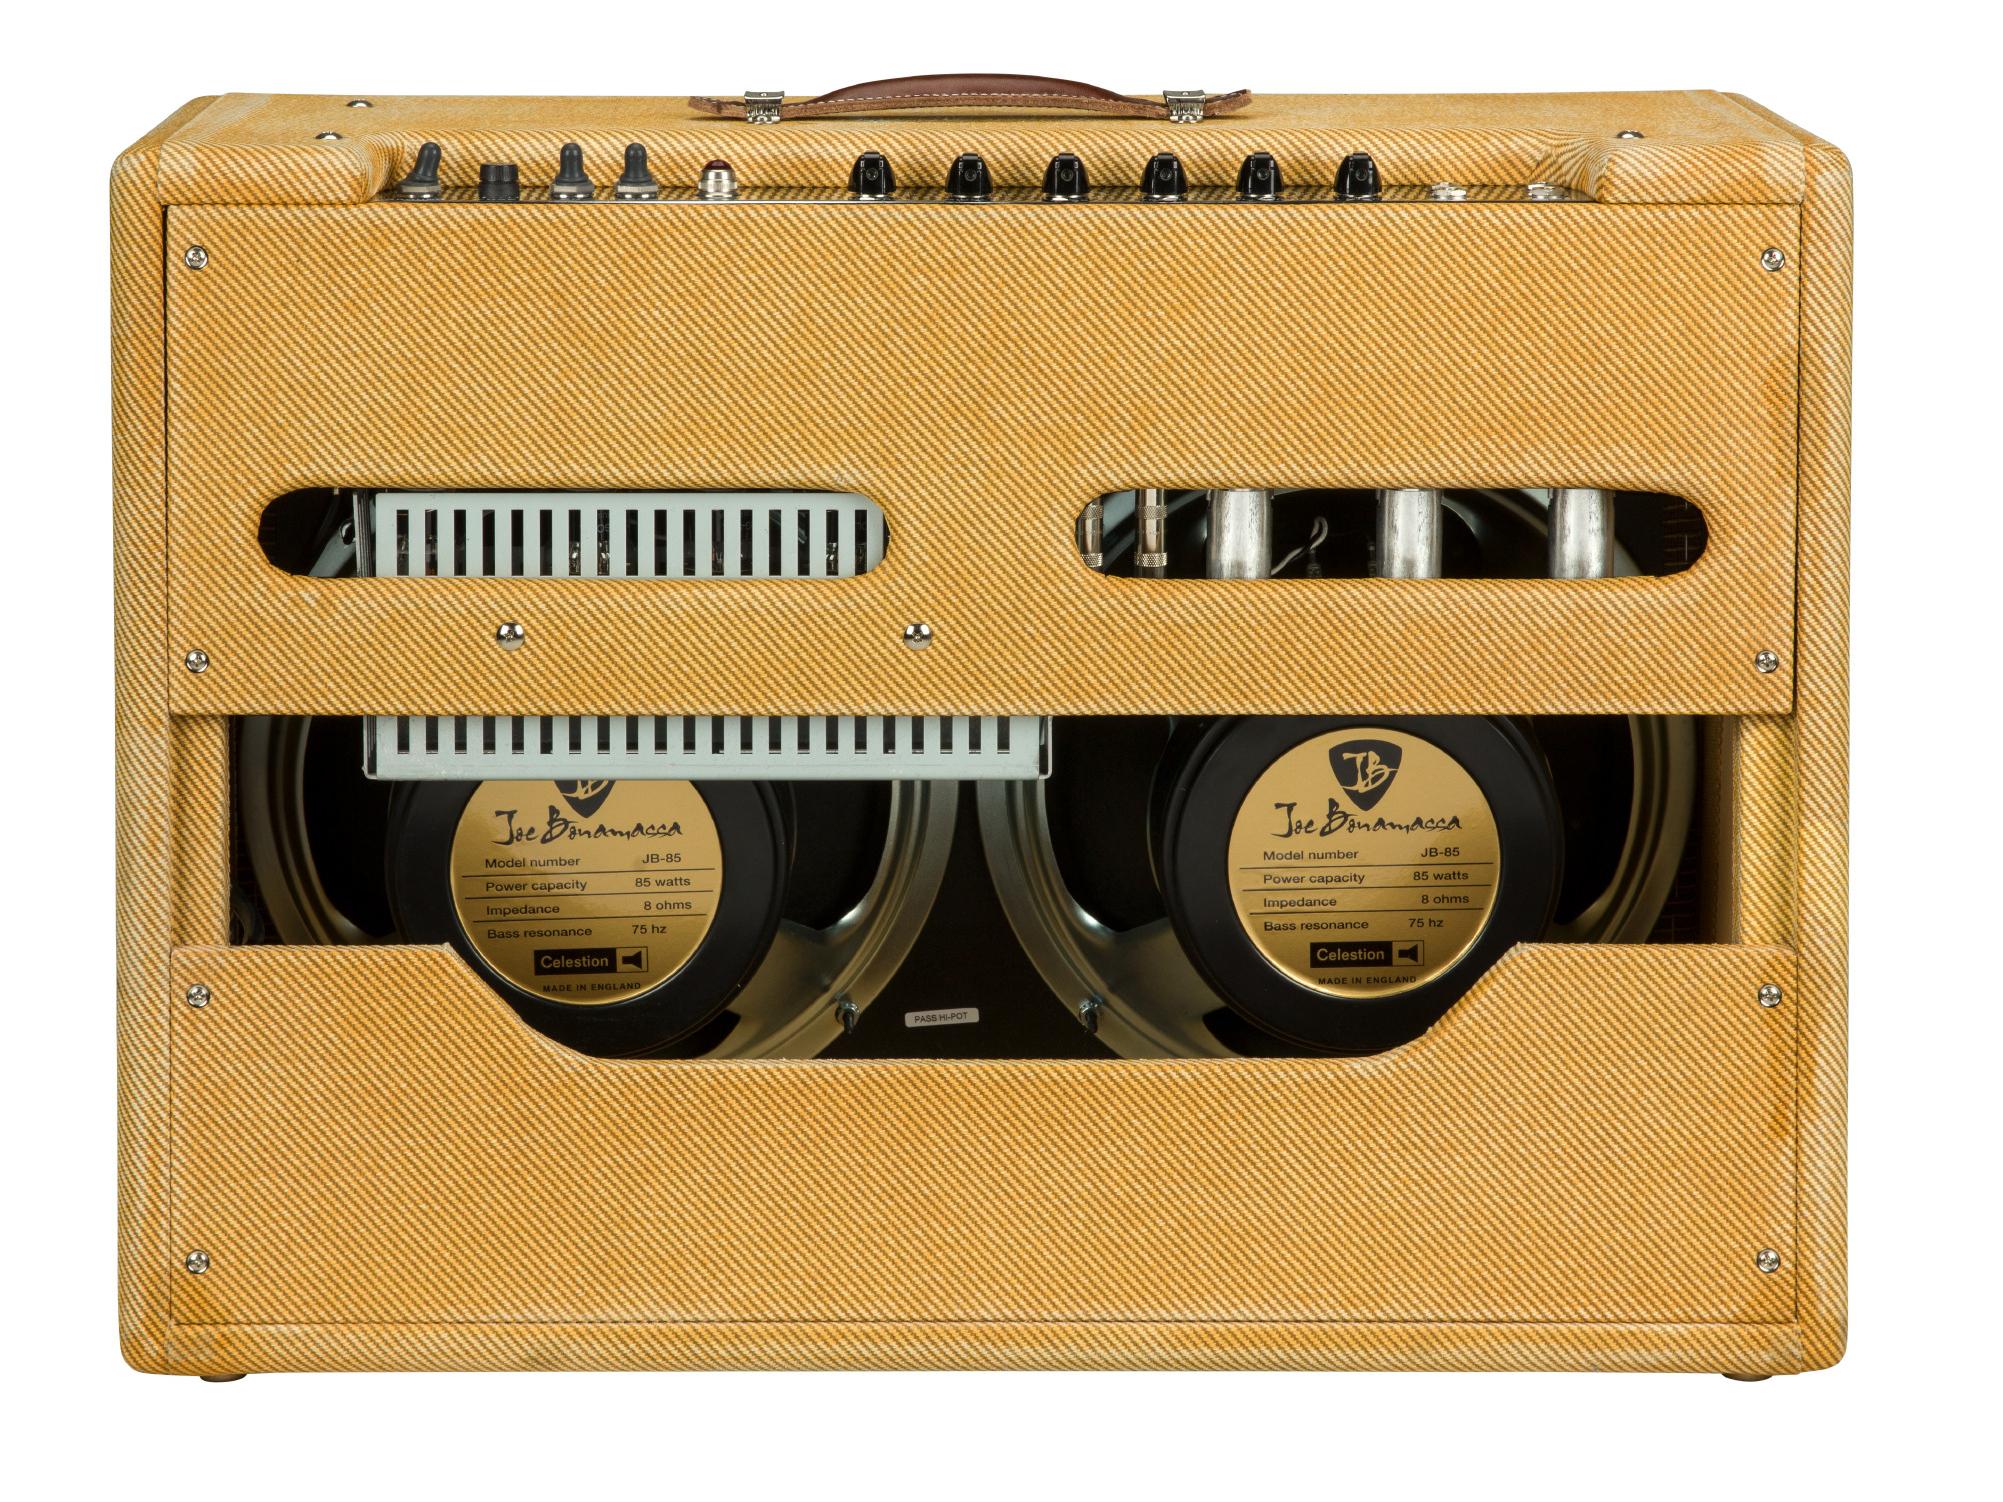 Fender '59 Twin Amp Joe Bonamassa Edition